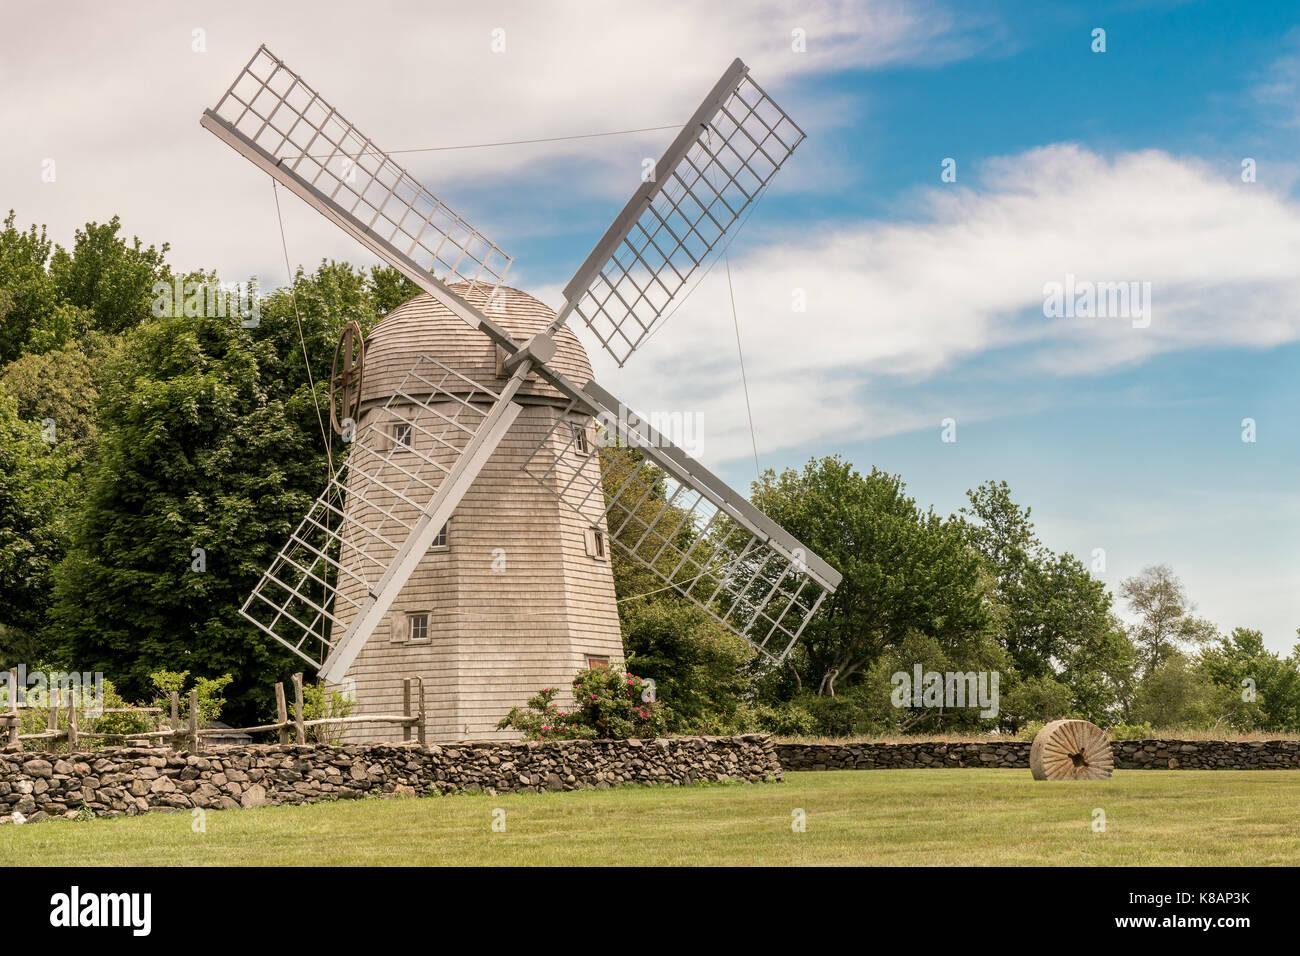 Historic Windmill found in Jamestown, Rhode Island - Stock Image